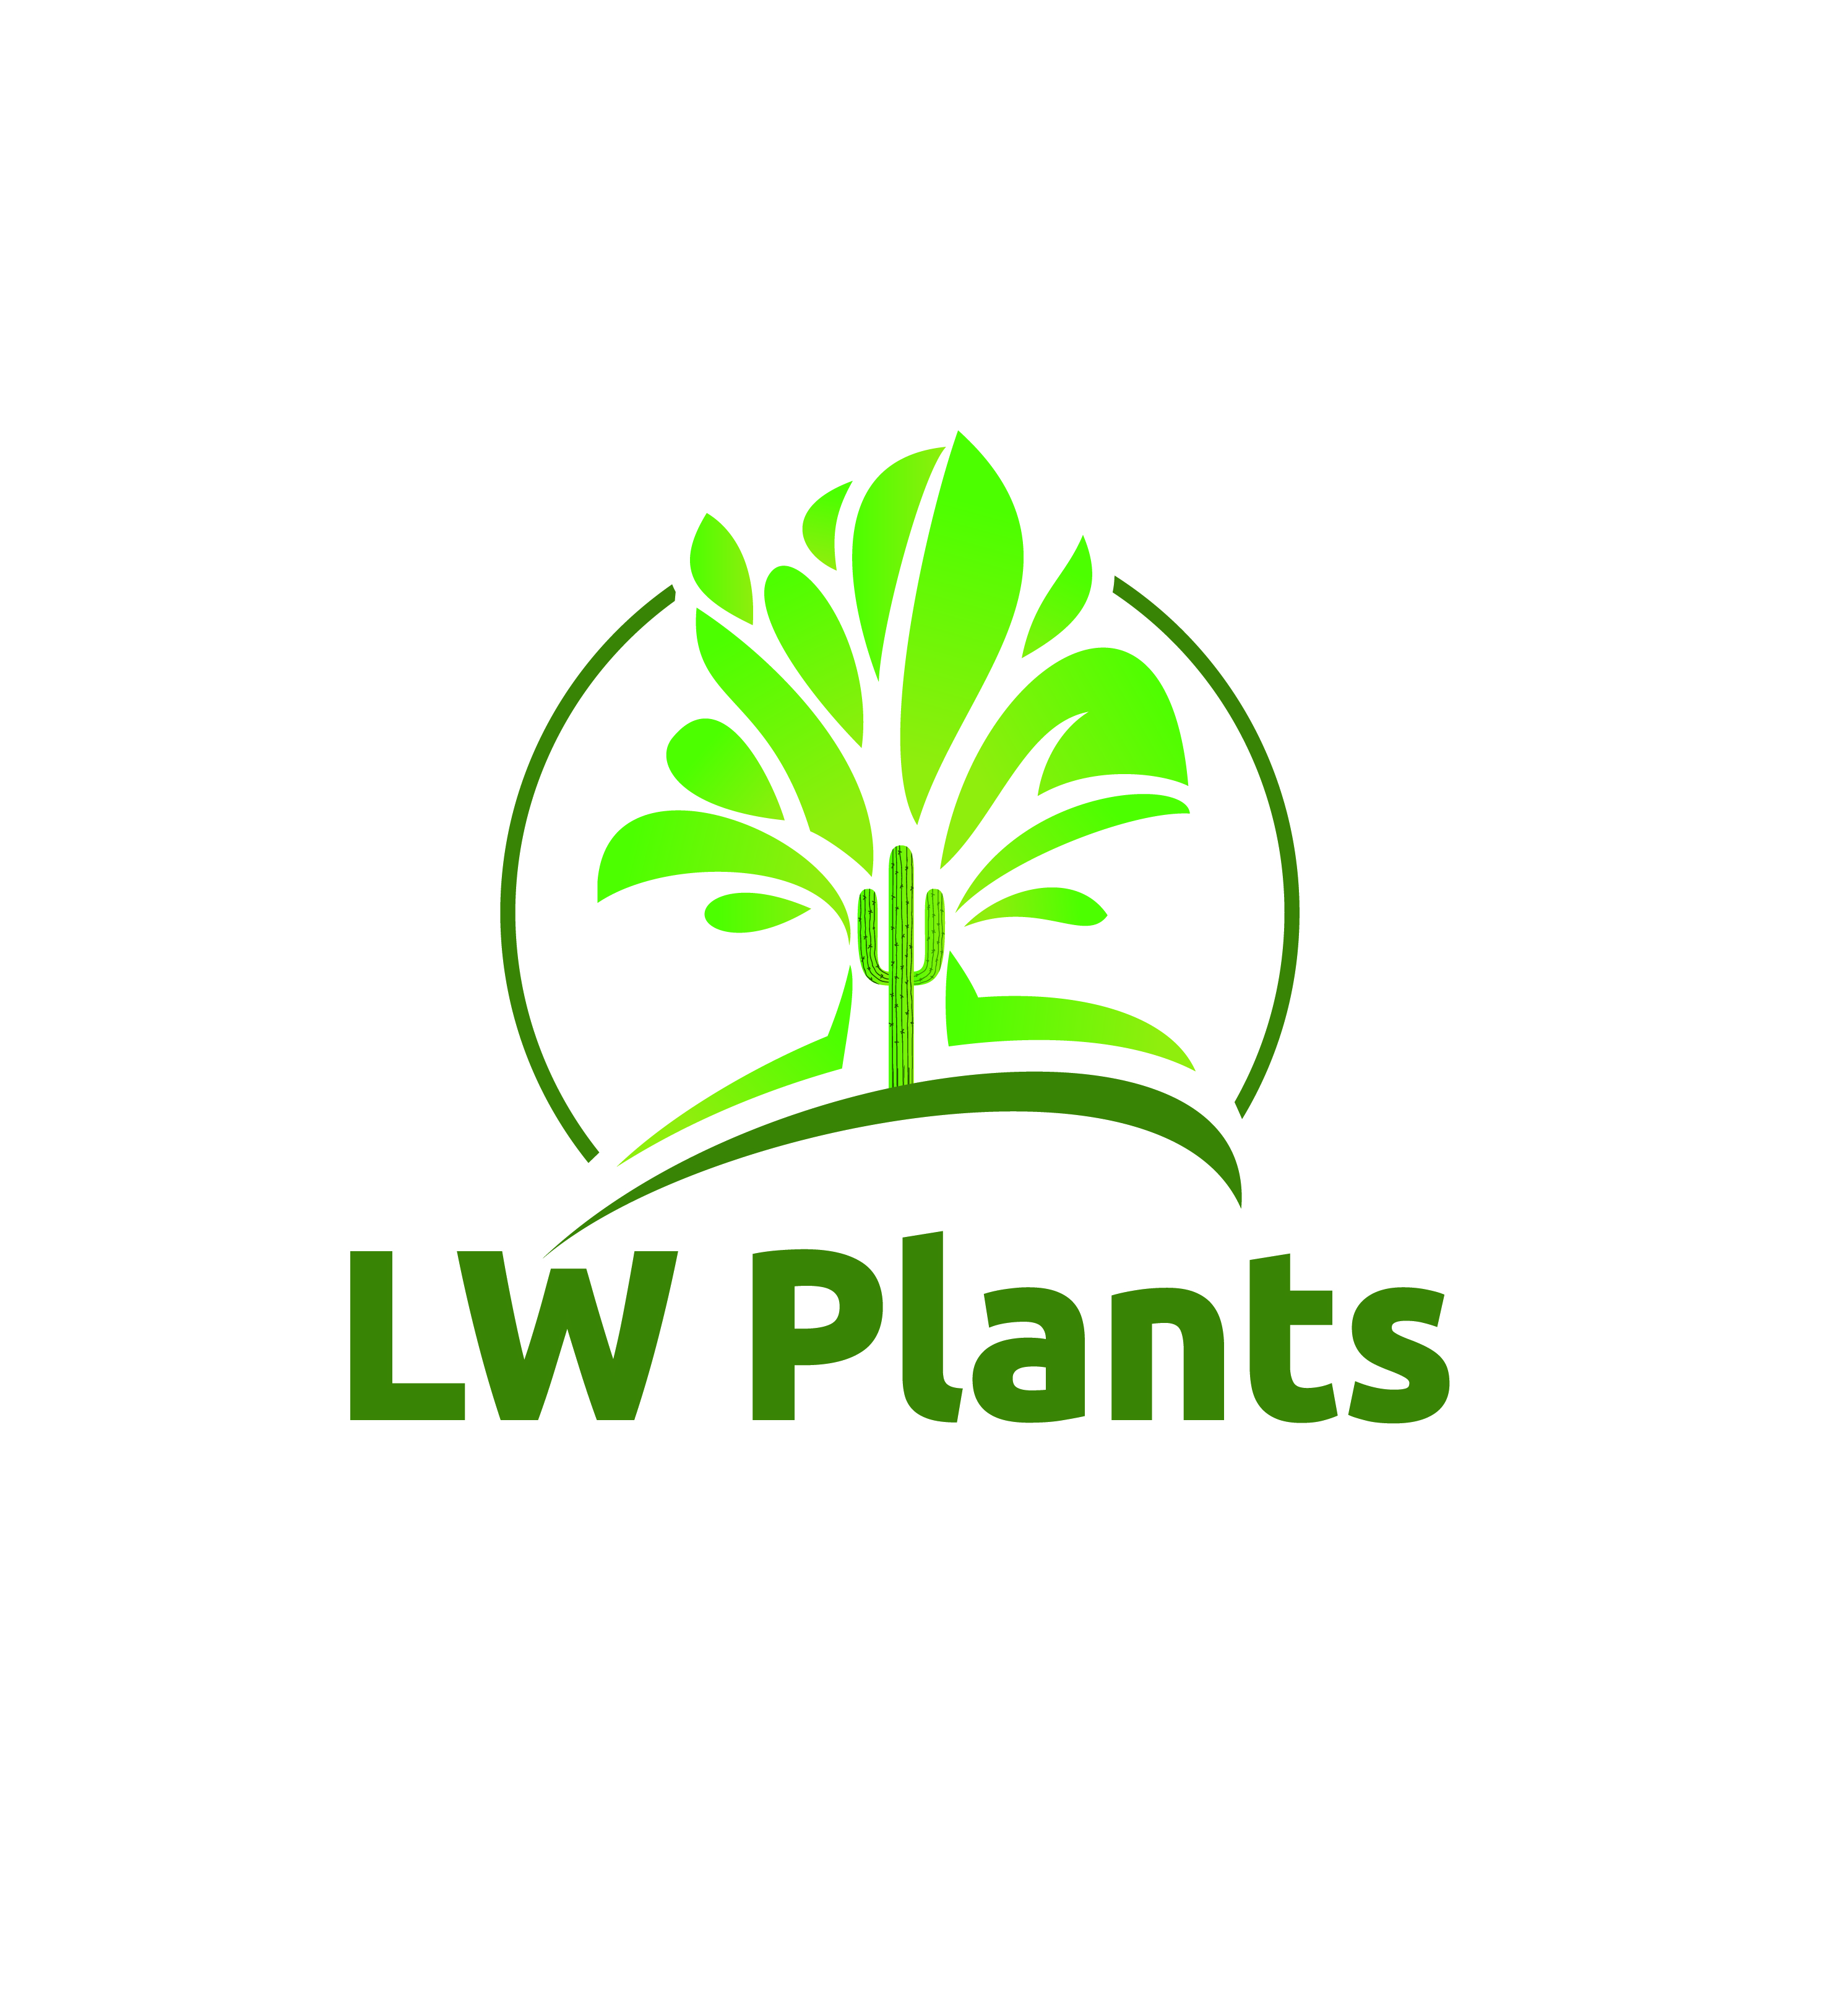 LW Plants